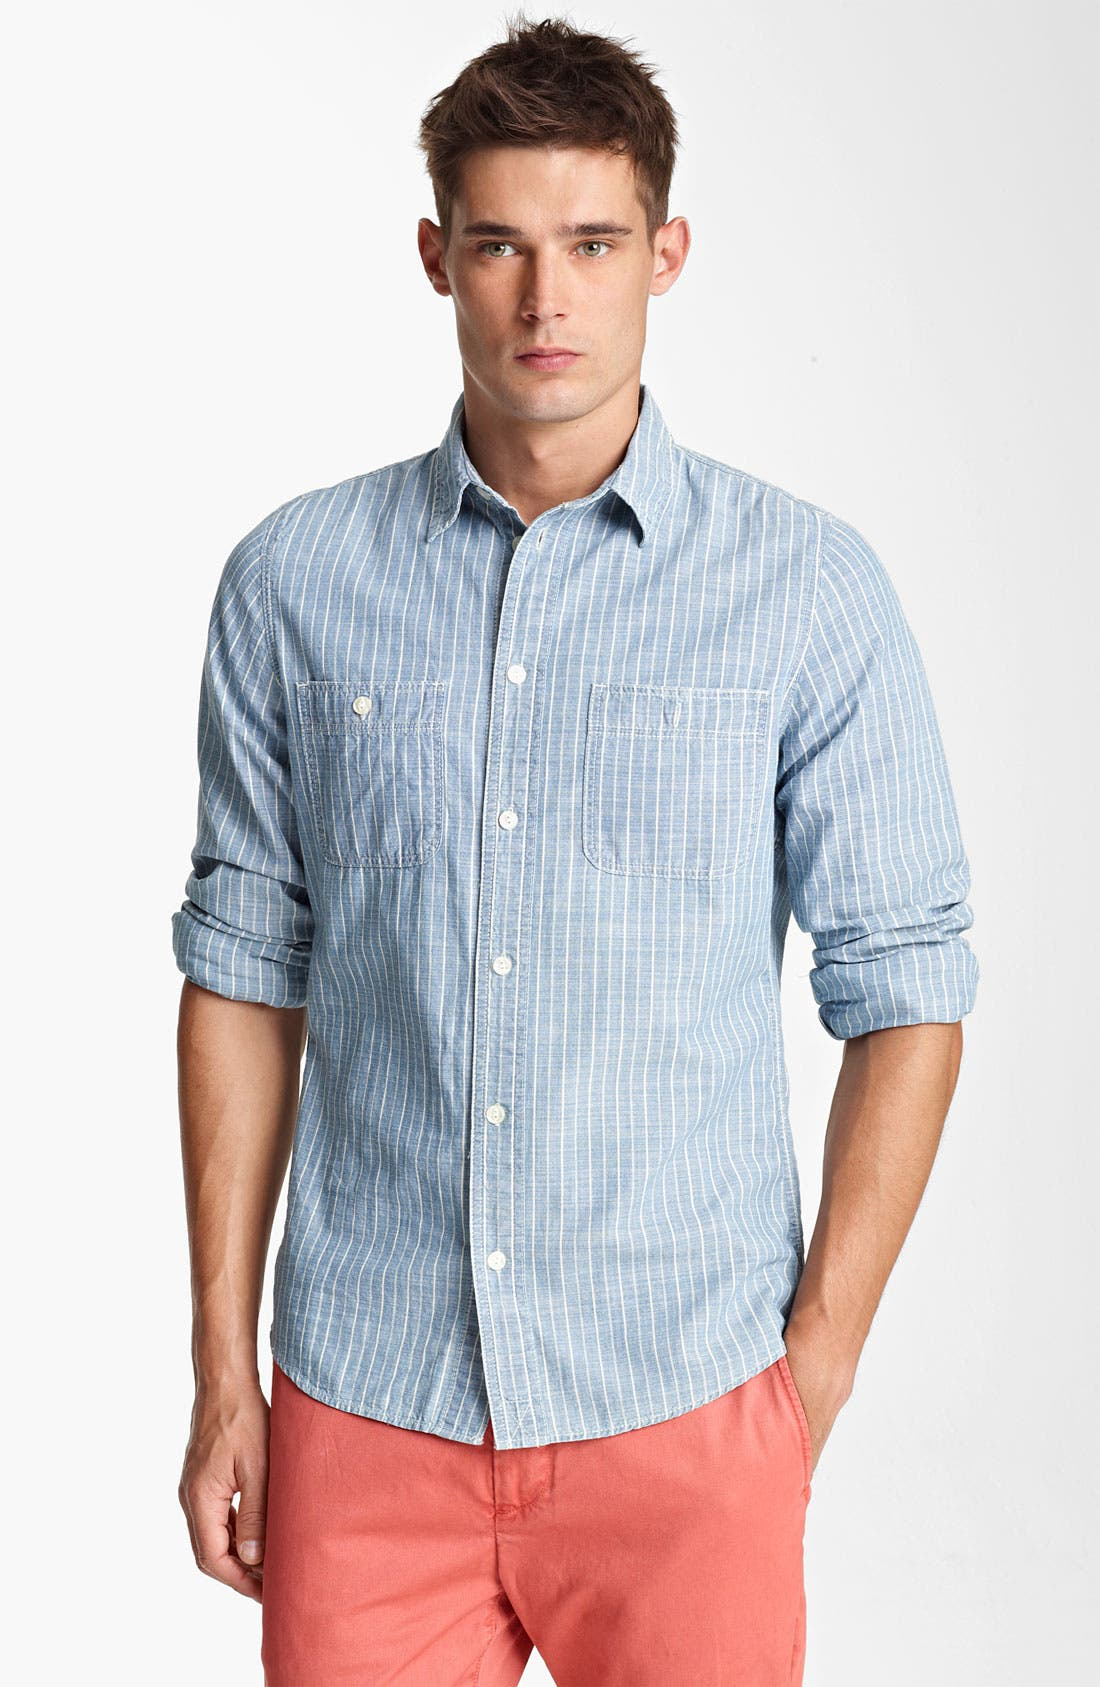 Alternate Image 1 Selected - Jack Spade 'Boomer' Stripe Work Shirt